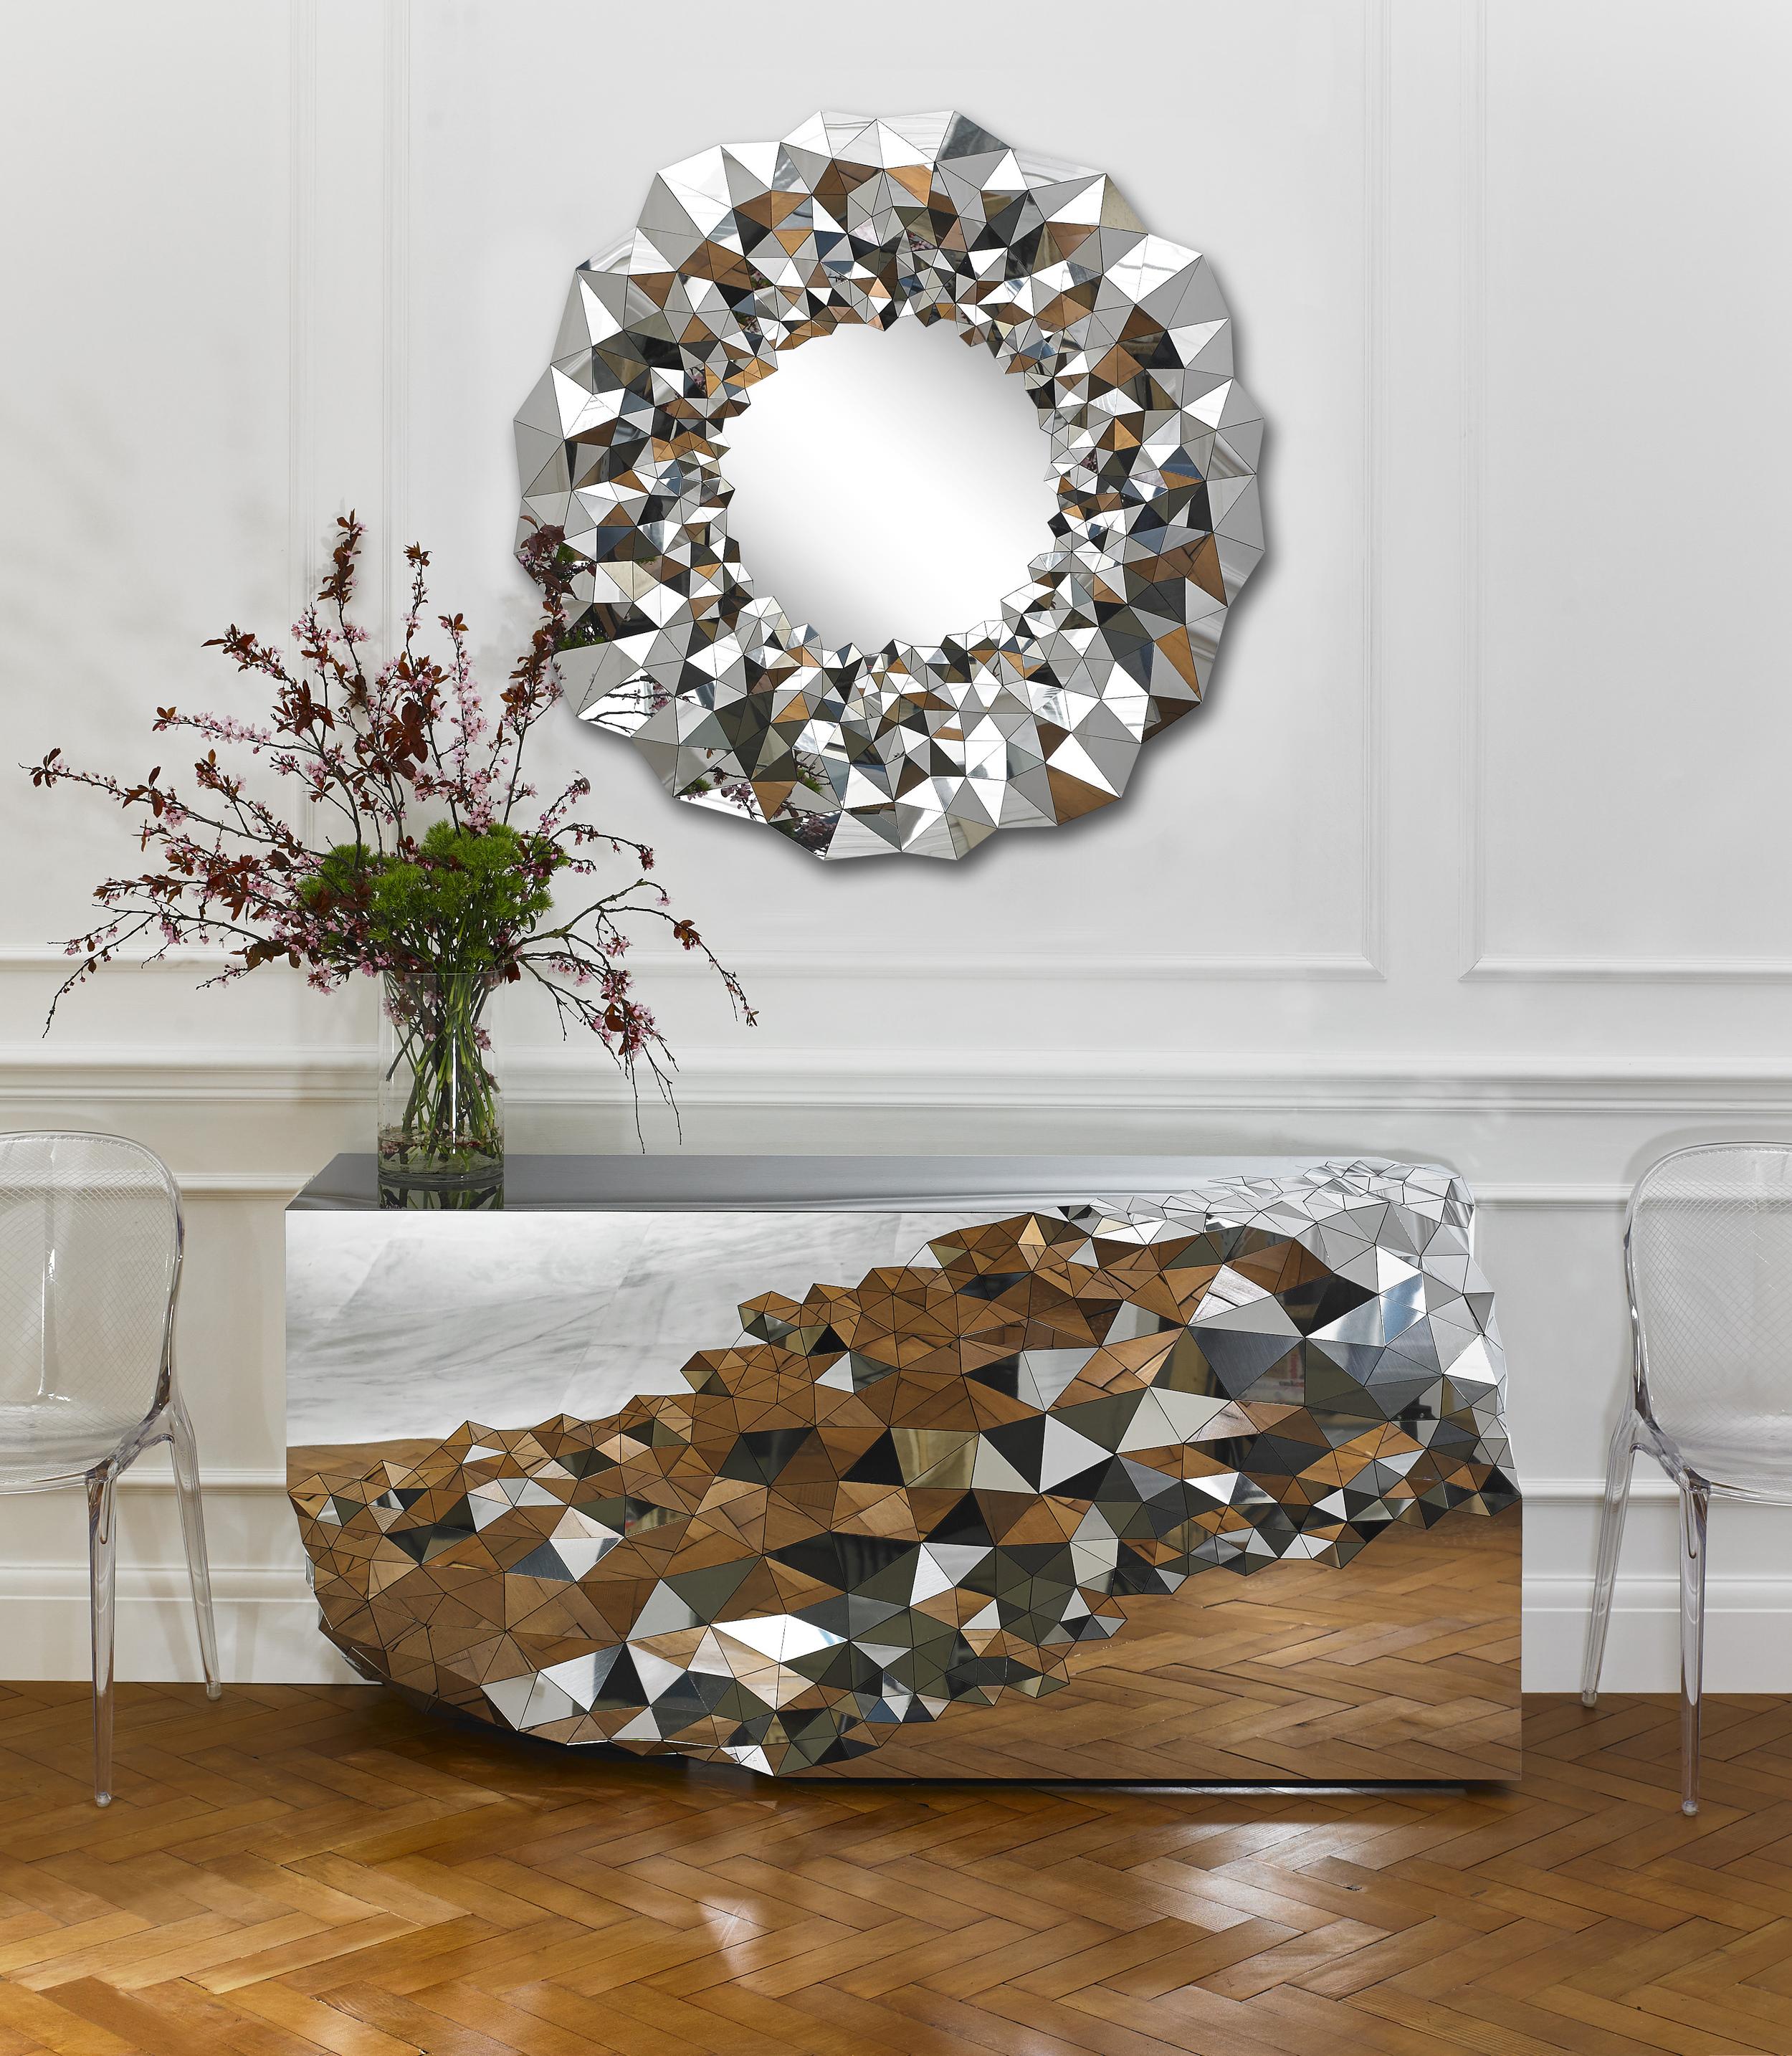 Stellar mirror and Console_ Jake Phipps_ HR lifestyle.jpg